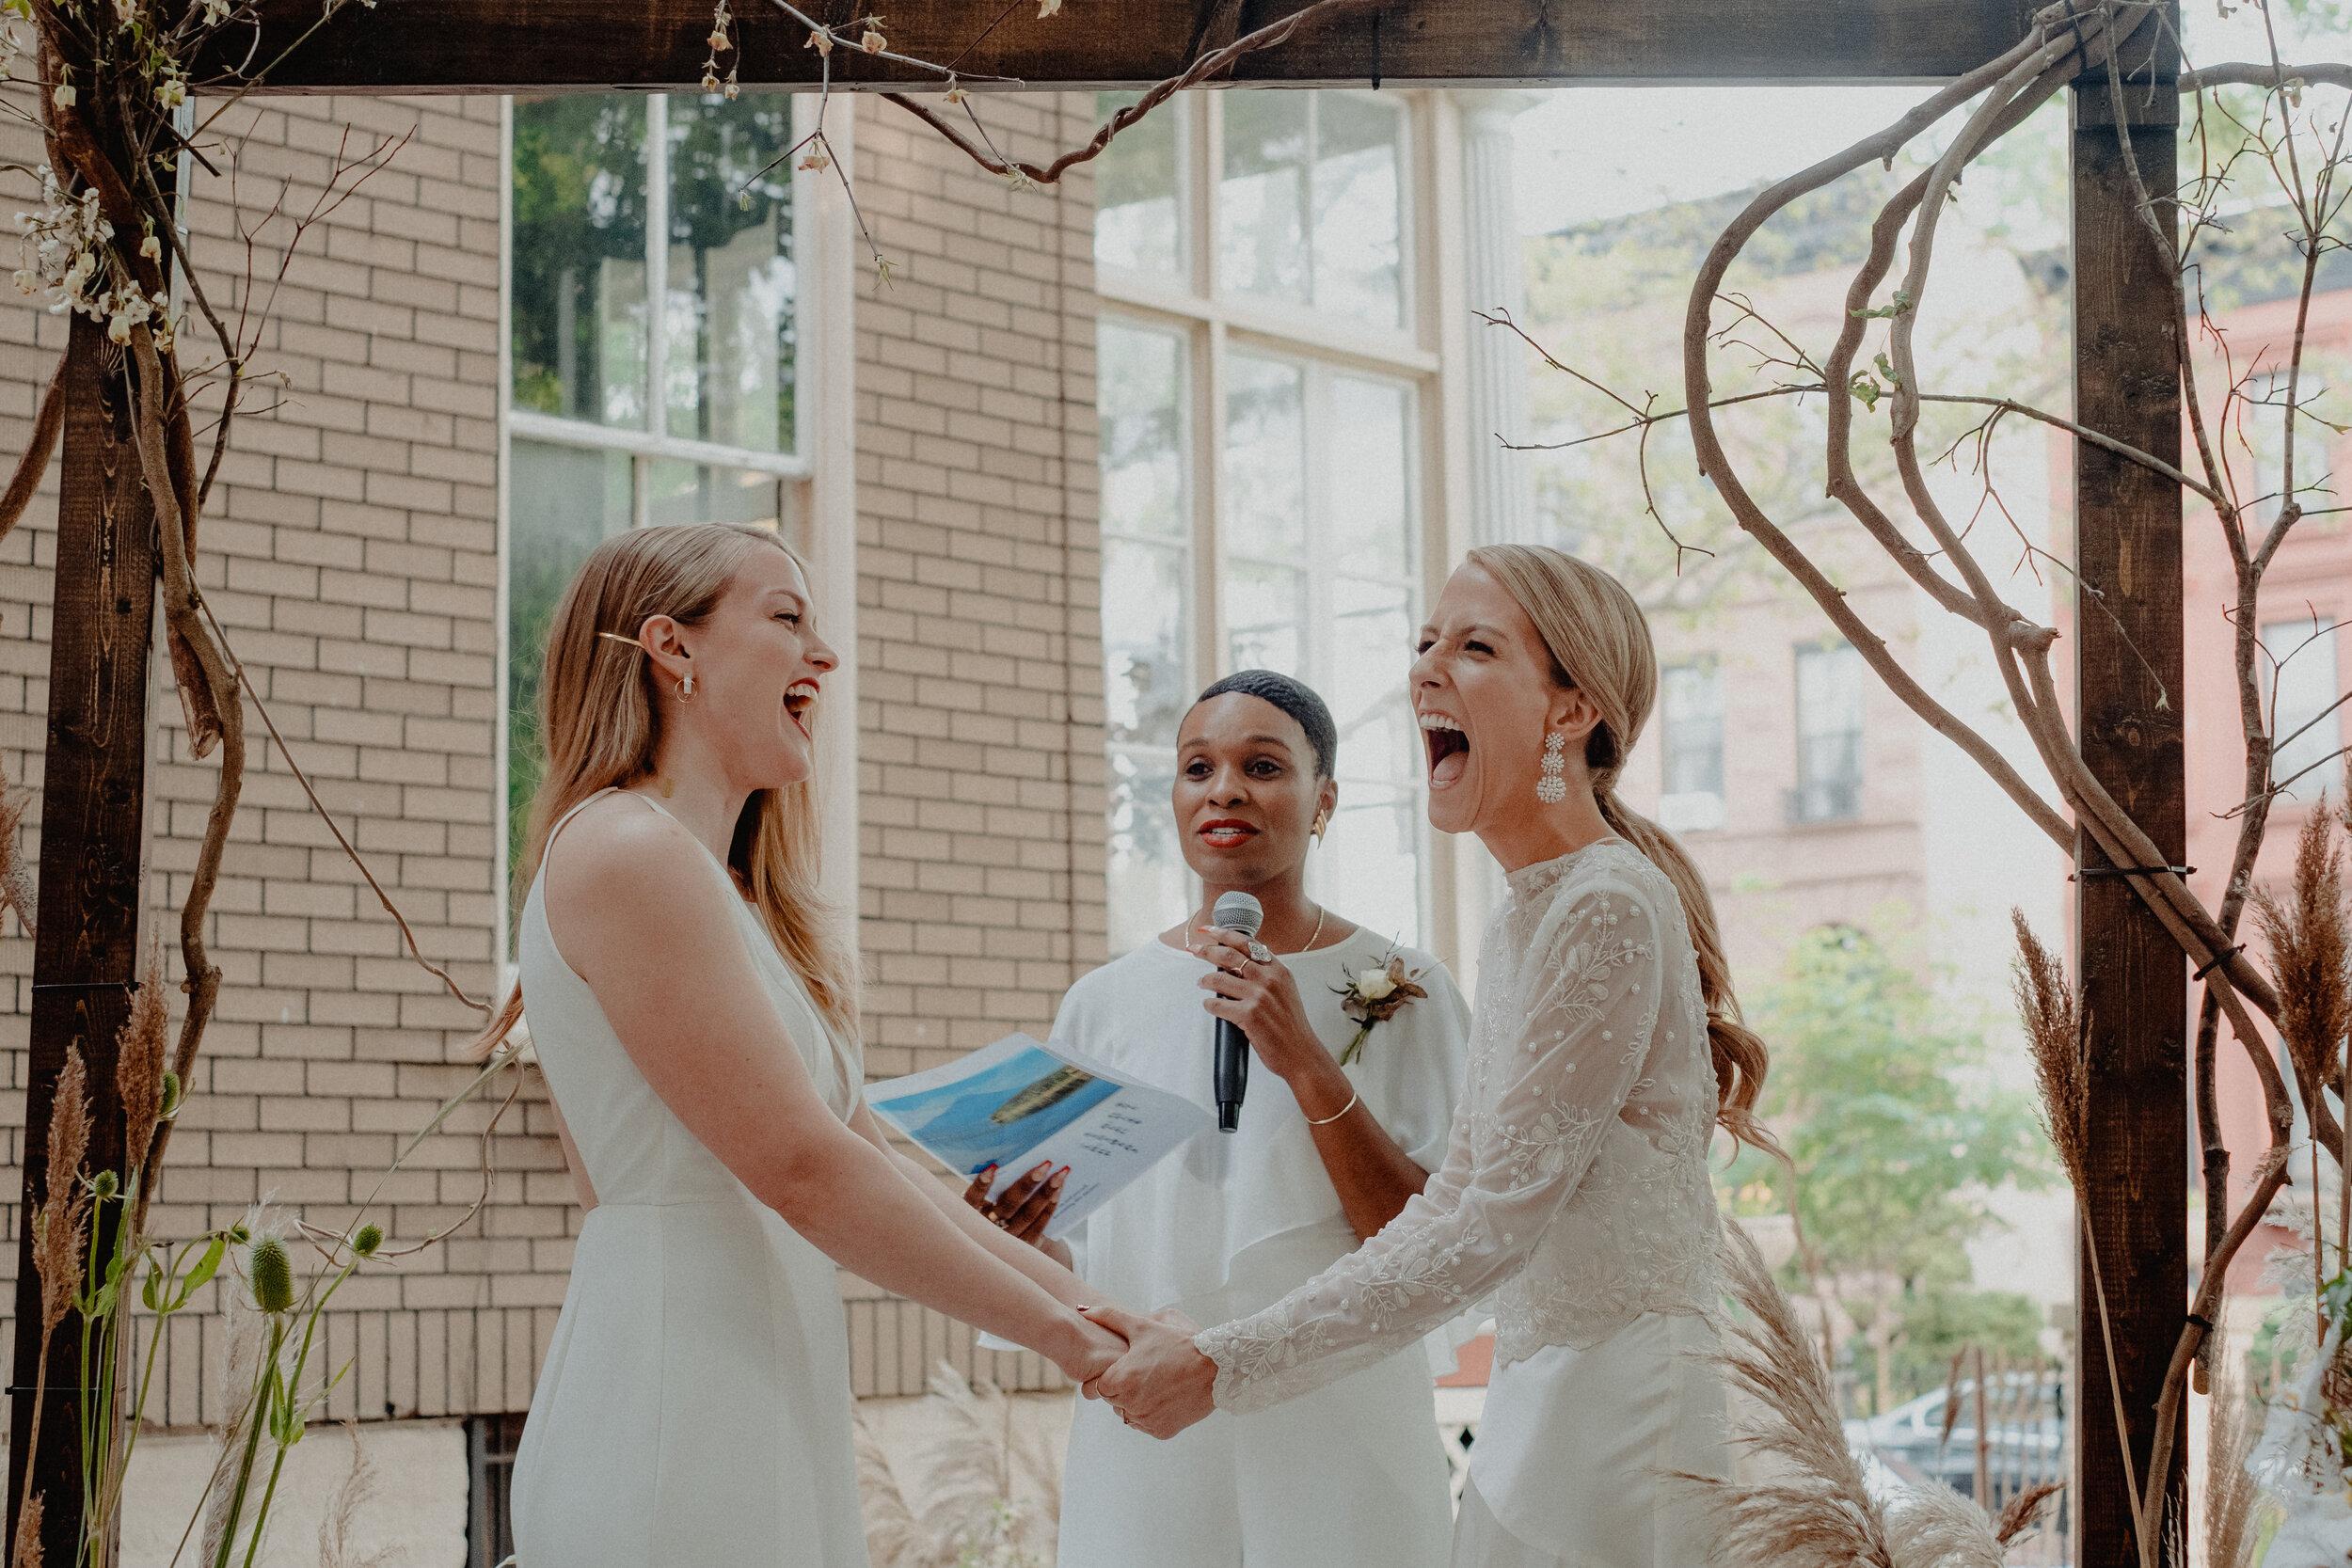 Katie_and_Malory_Akwaaba_Mansion_Wedding_Chellise_Michael_Photography_241.jpg